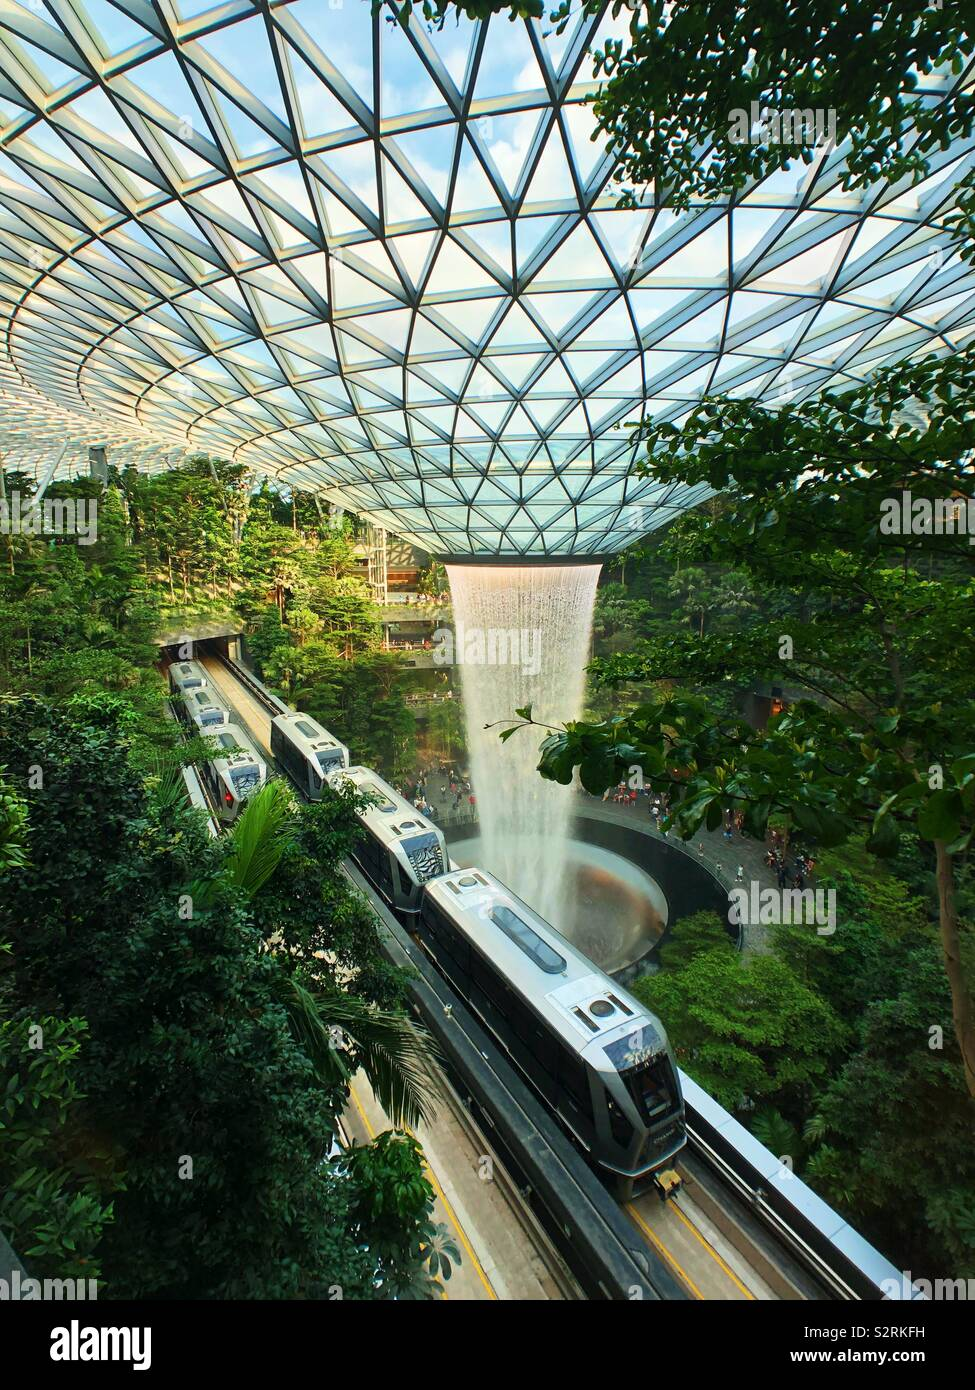 Joya, el aeropuerto de Singapur. Imagen De Stock